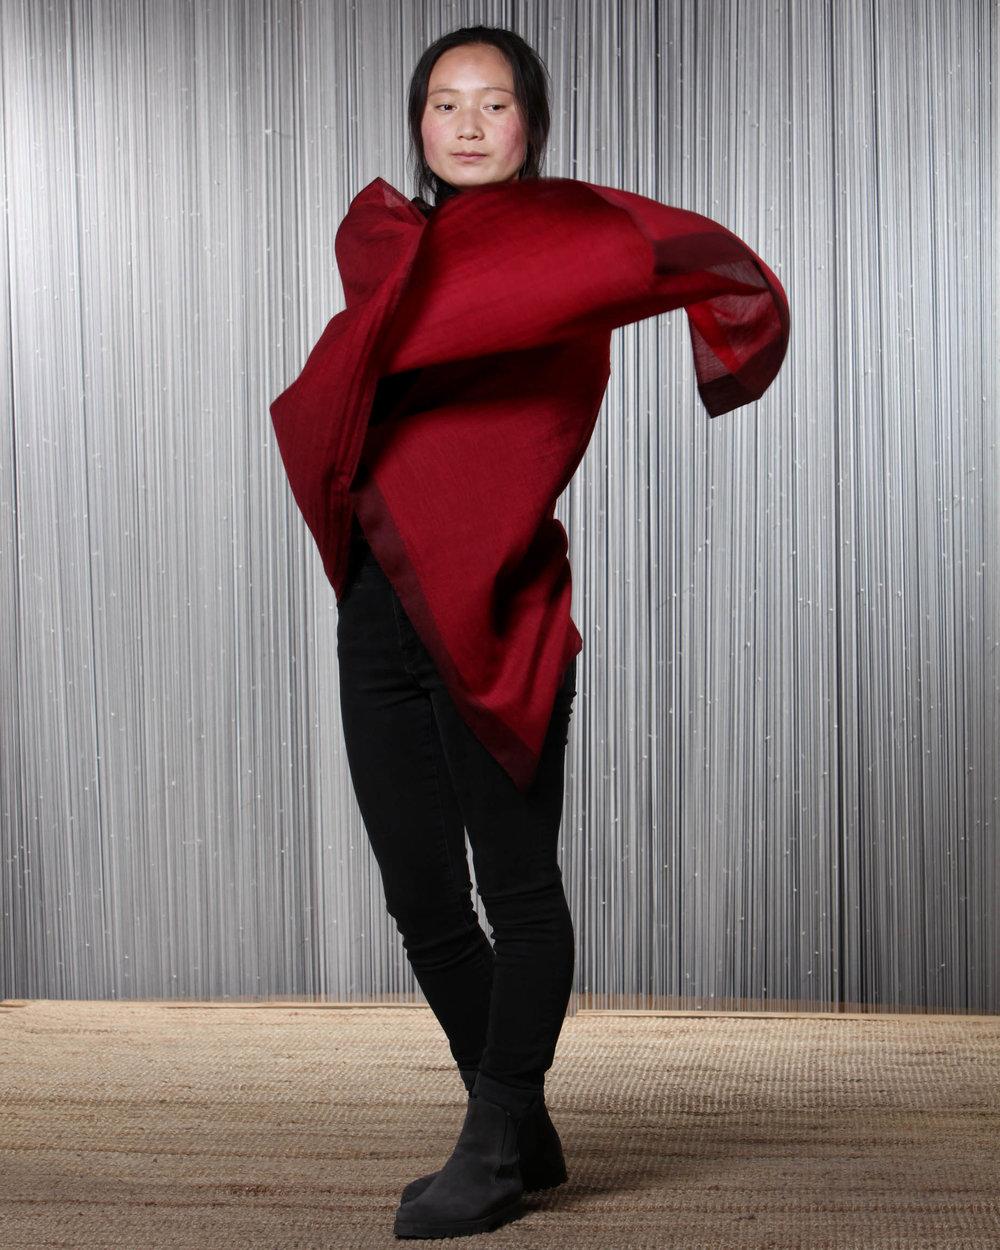 Pema Ta modelling shawls, Norlha Factory, Ritoma, Amdo, Tibet